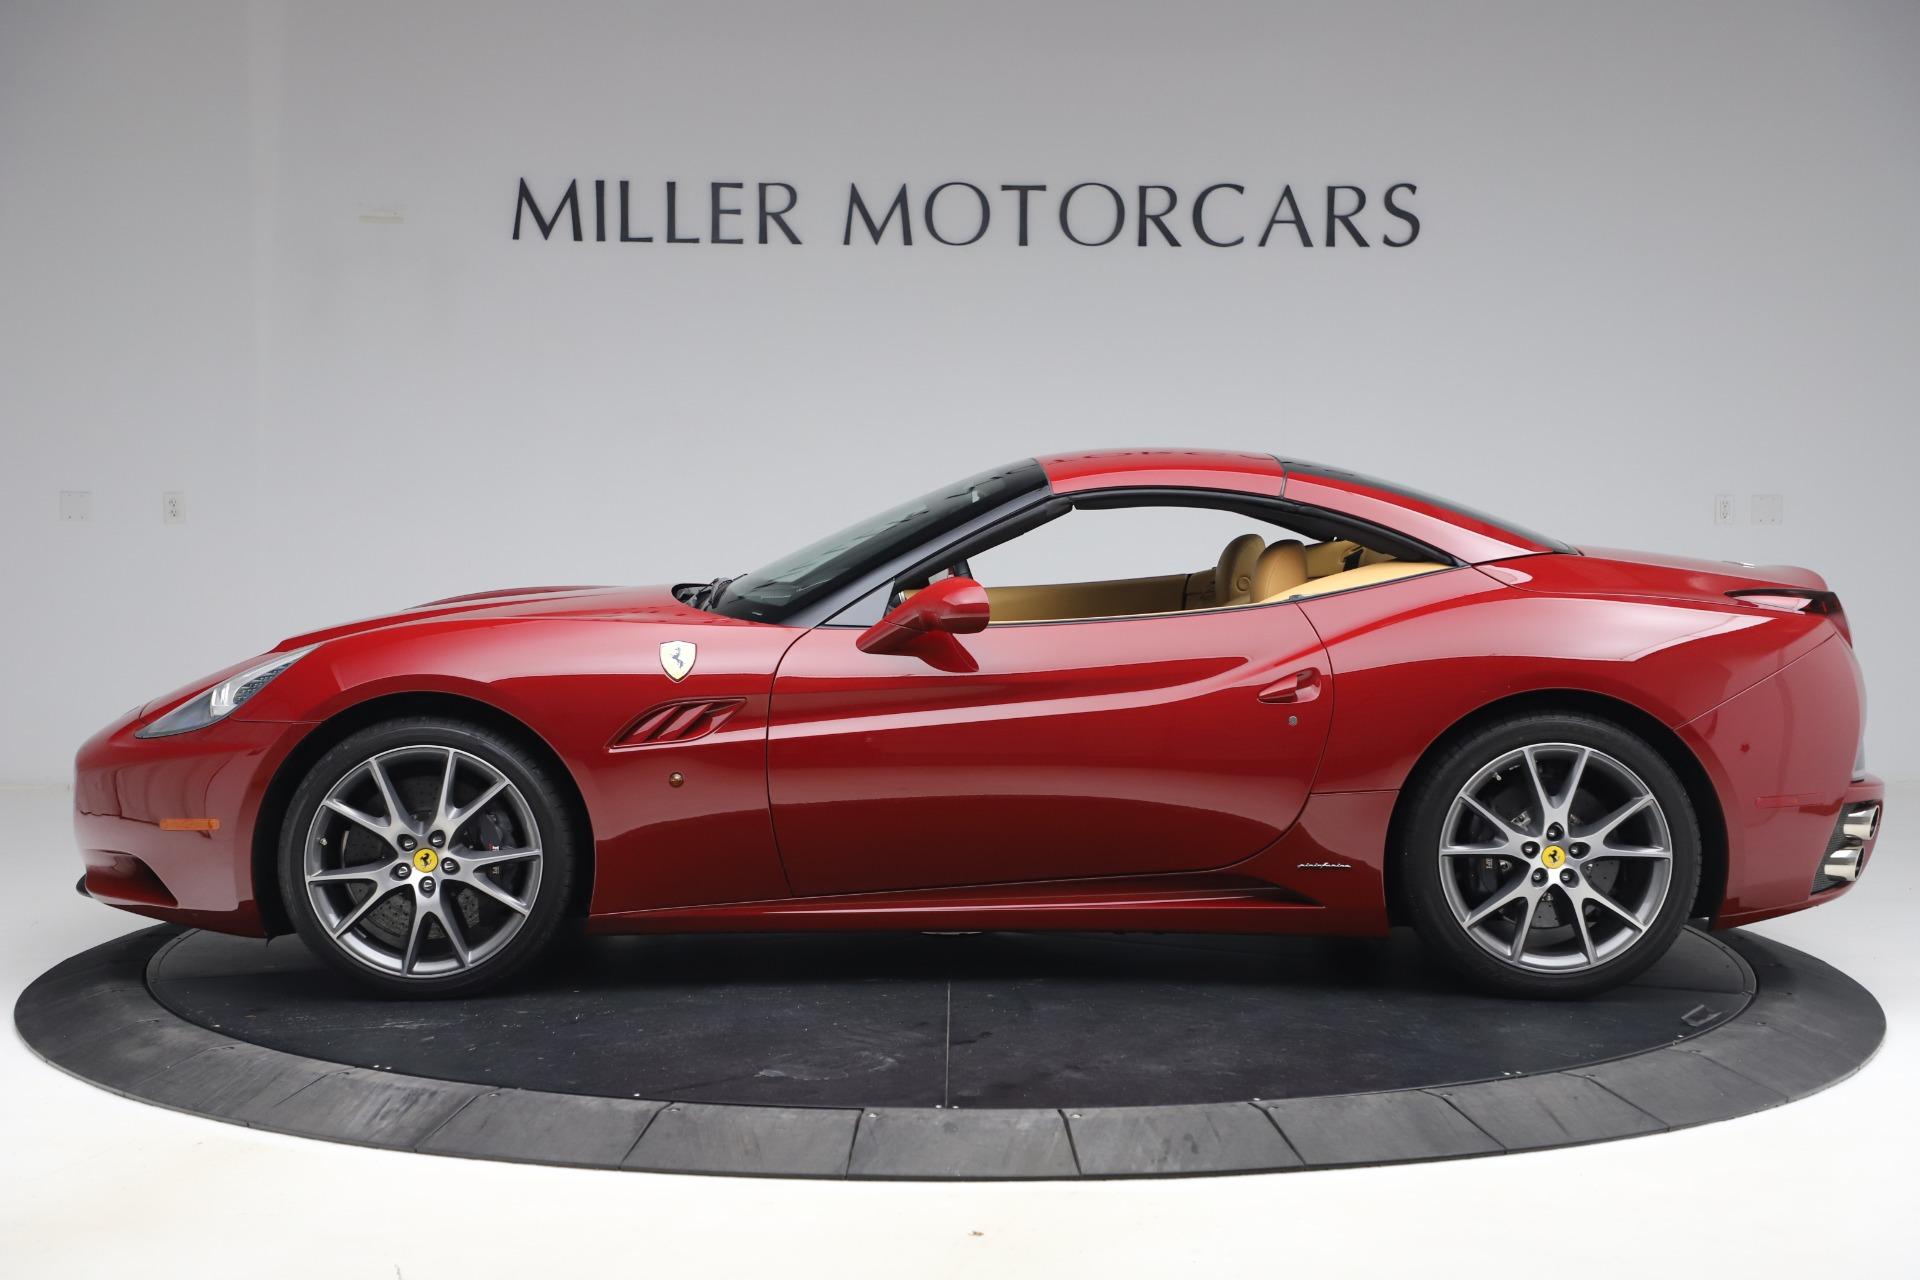 Pre-Owned 2014 Ferrari California 30 For Sale | Ferrari of ...